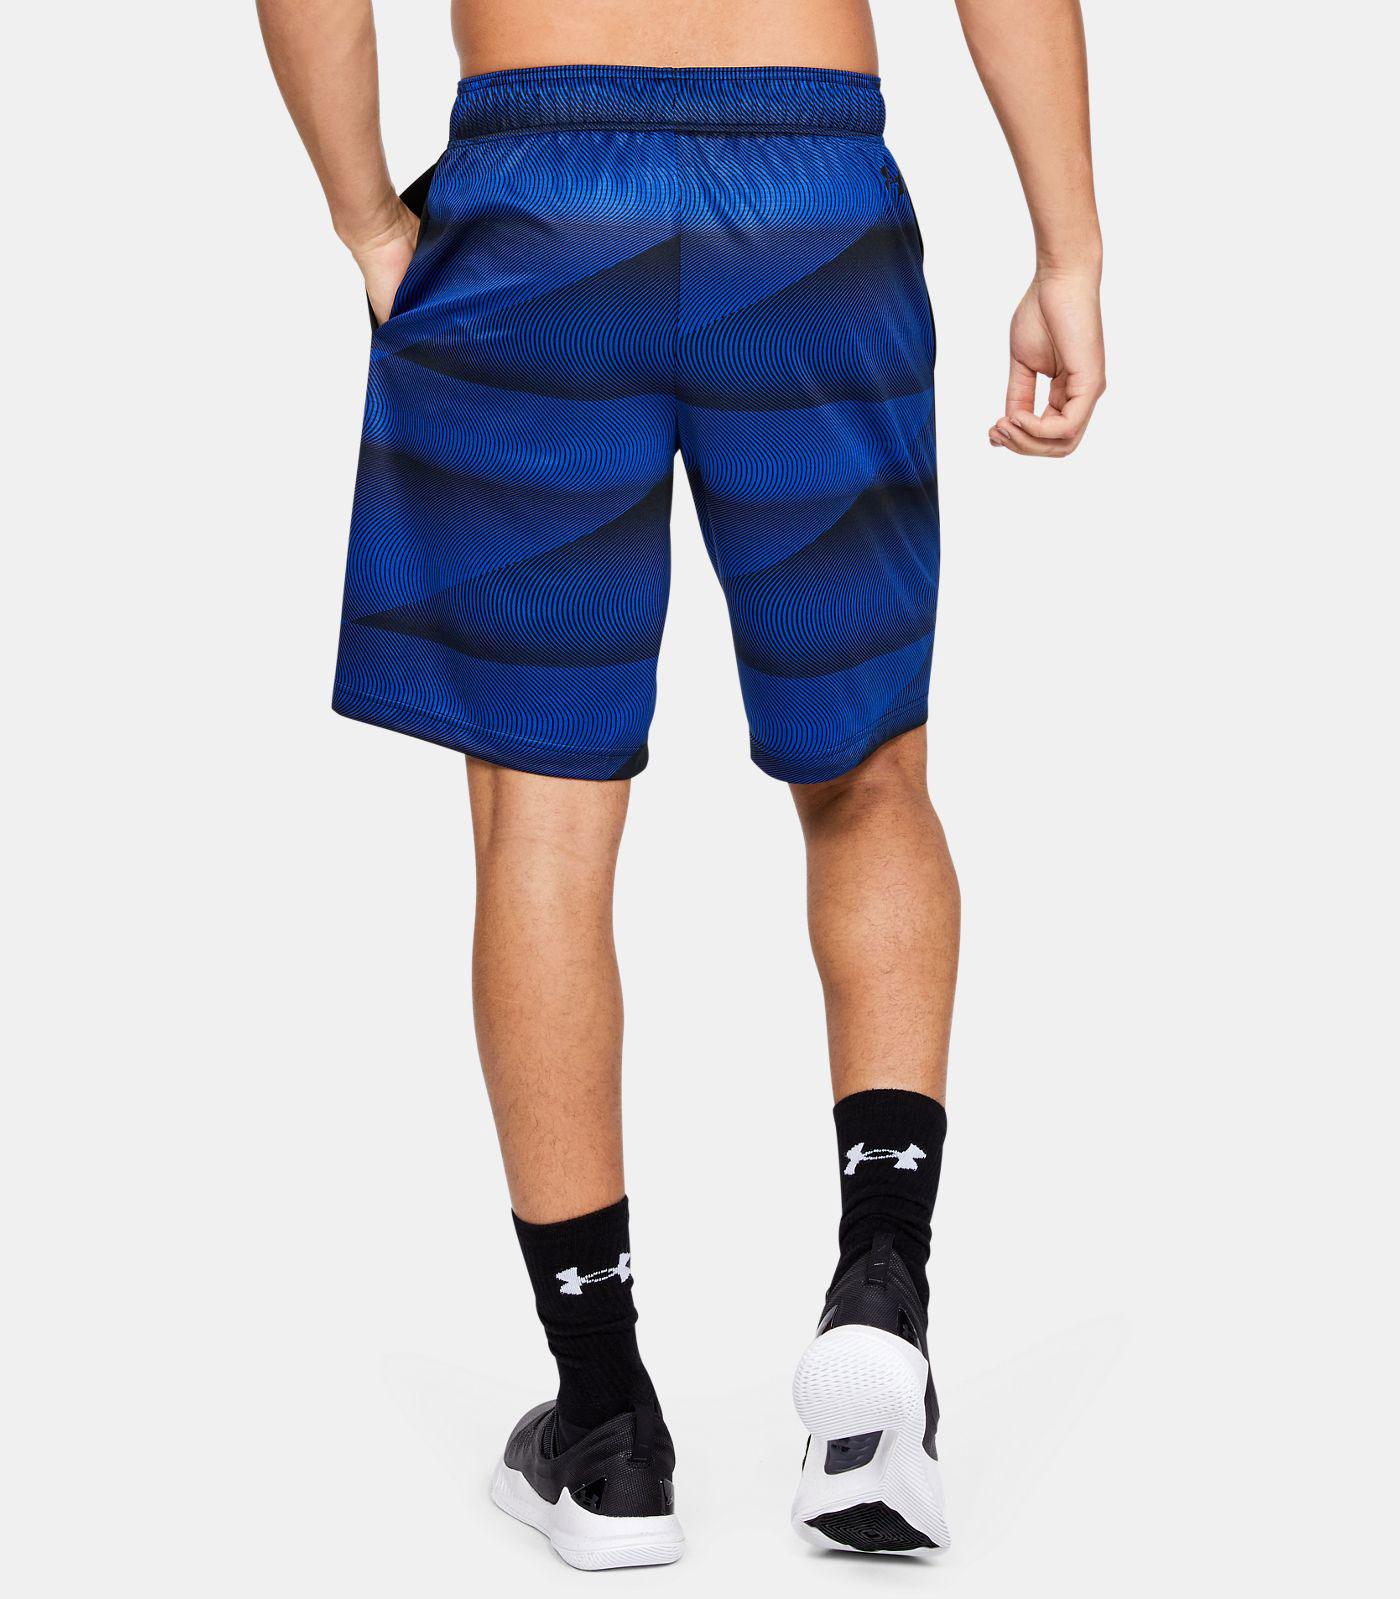 curry-7-dub-nation-shorts-2